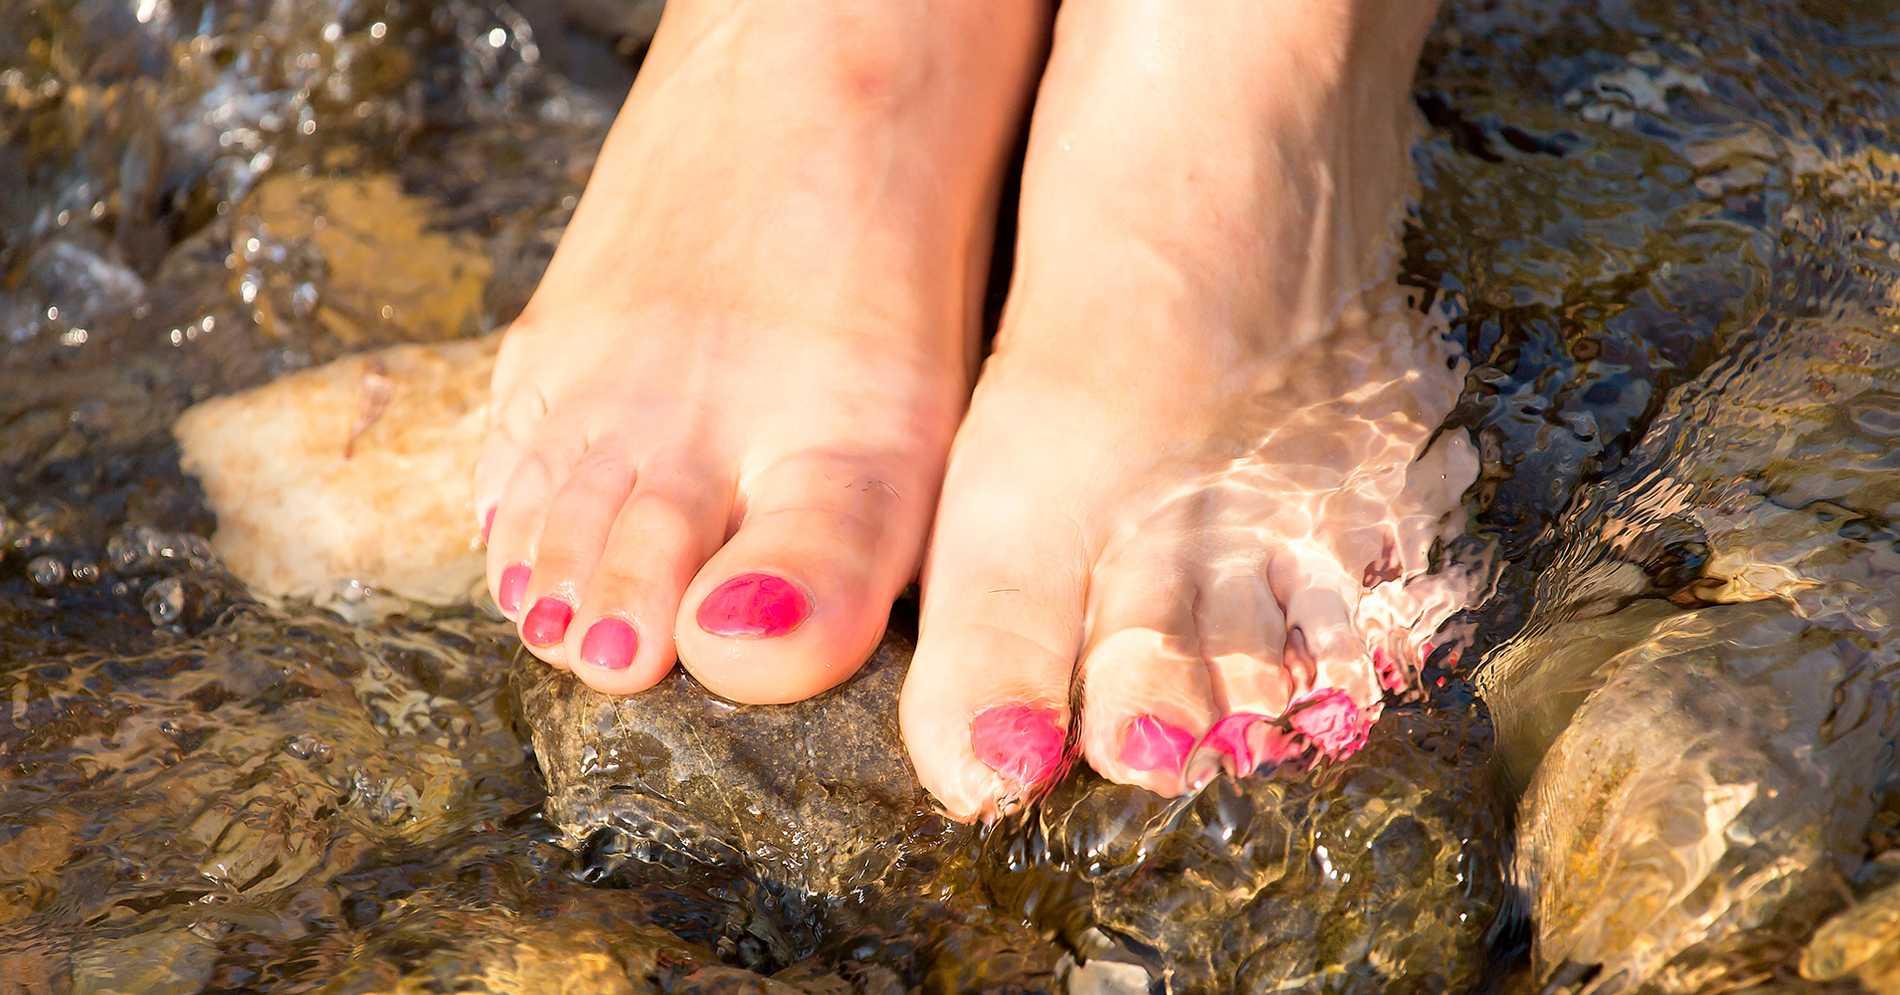 åsas fina fötter